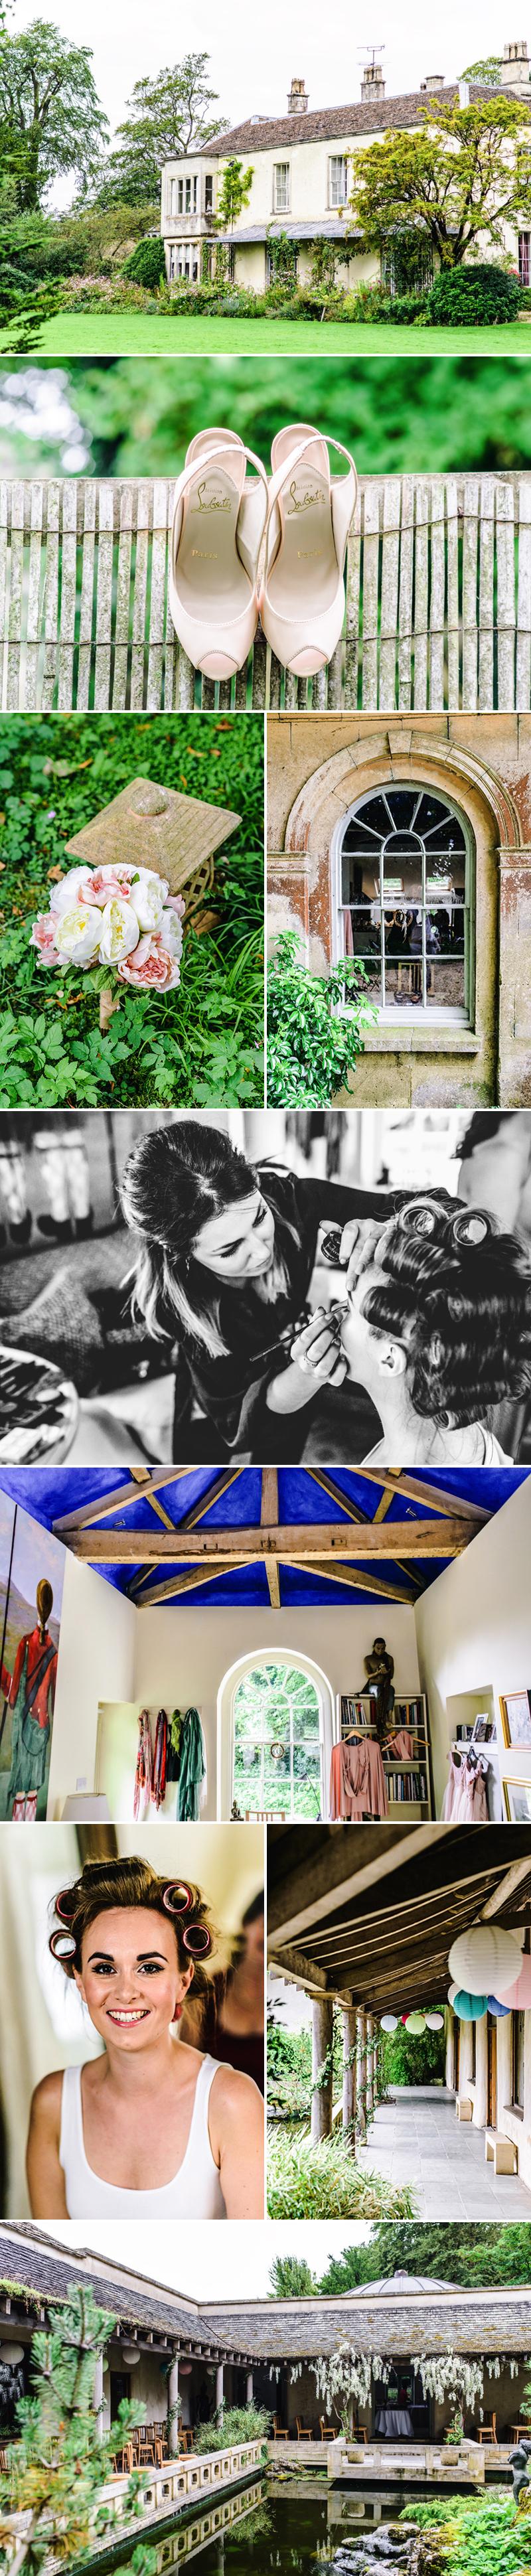 wedding-venues-in-gloucestershire-matara-centre-big-eye-photography-001